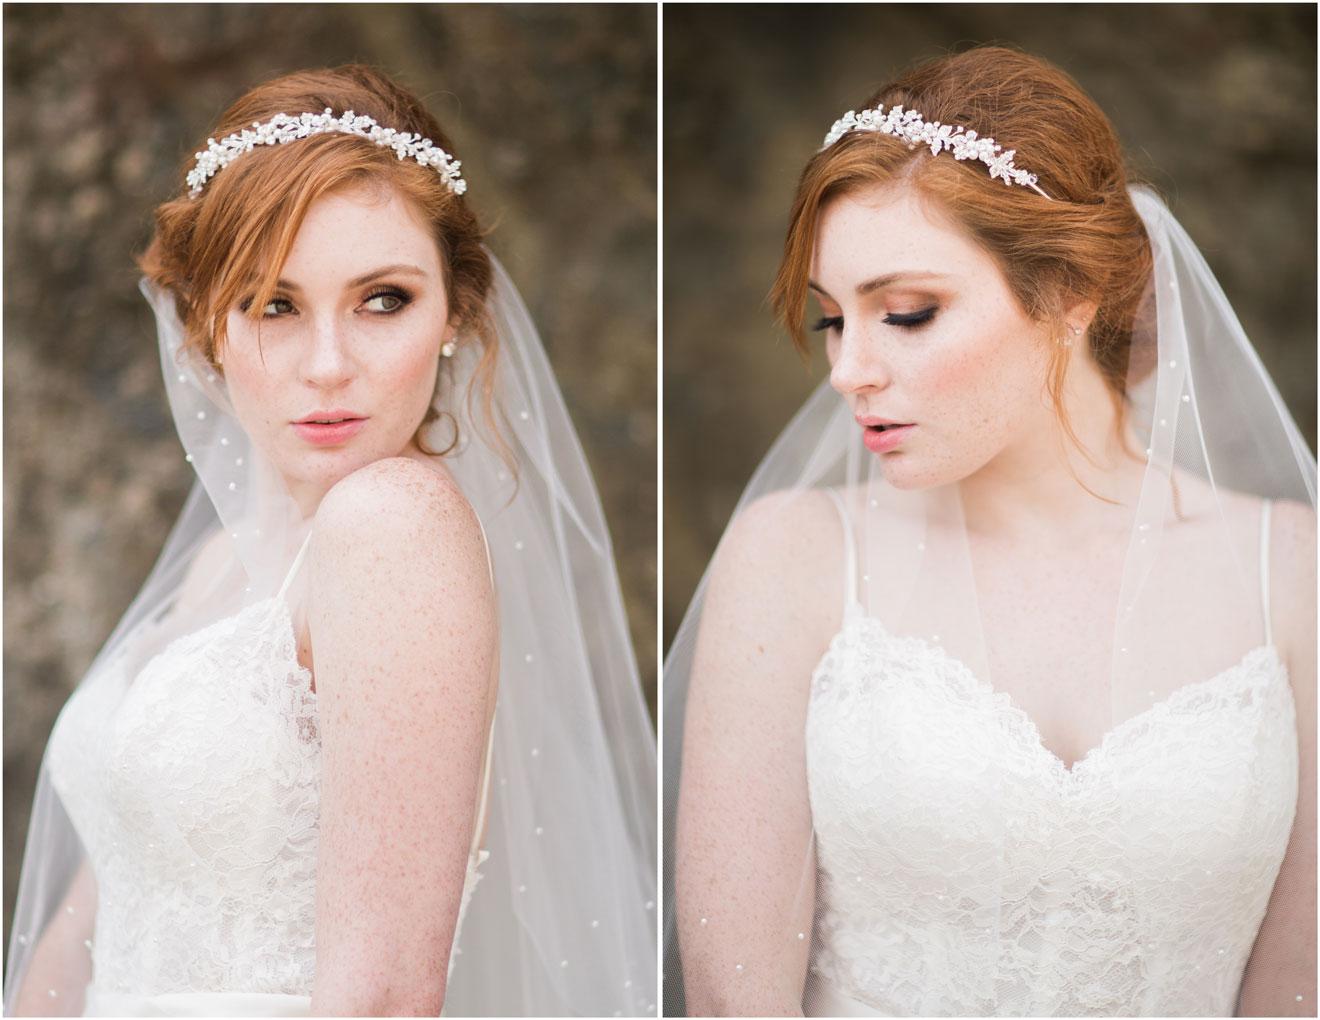 Bel-Aire-Bridal-Jen-Fuj-Photography-6531